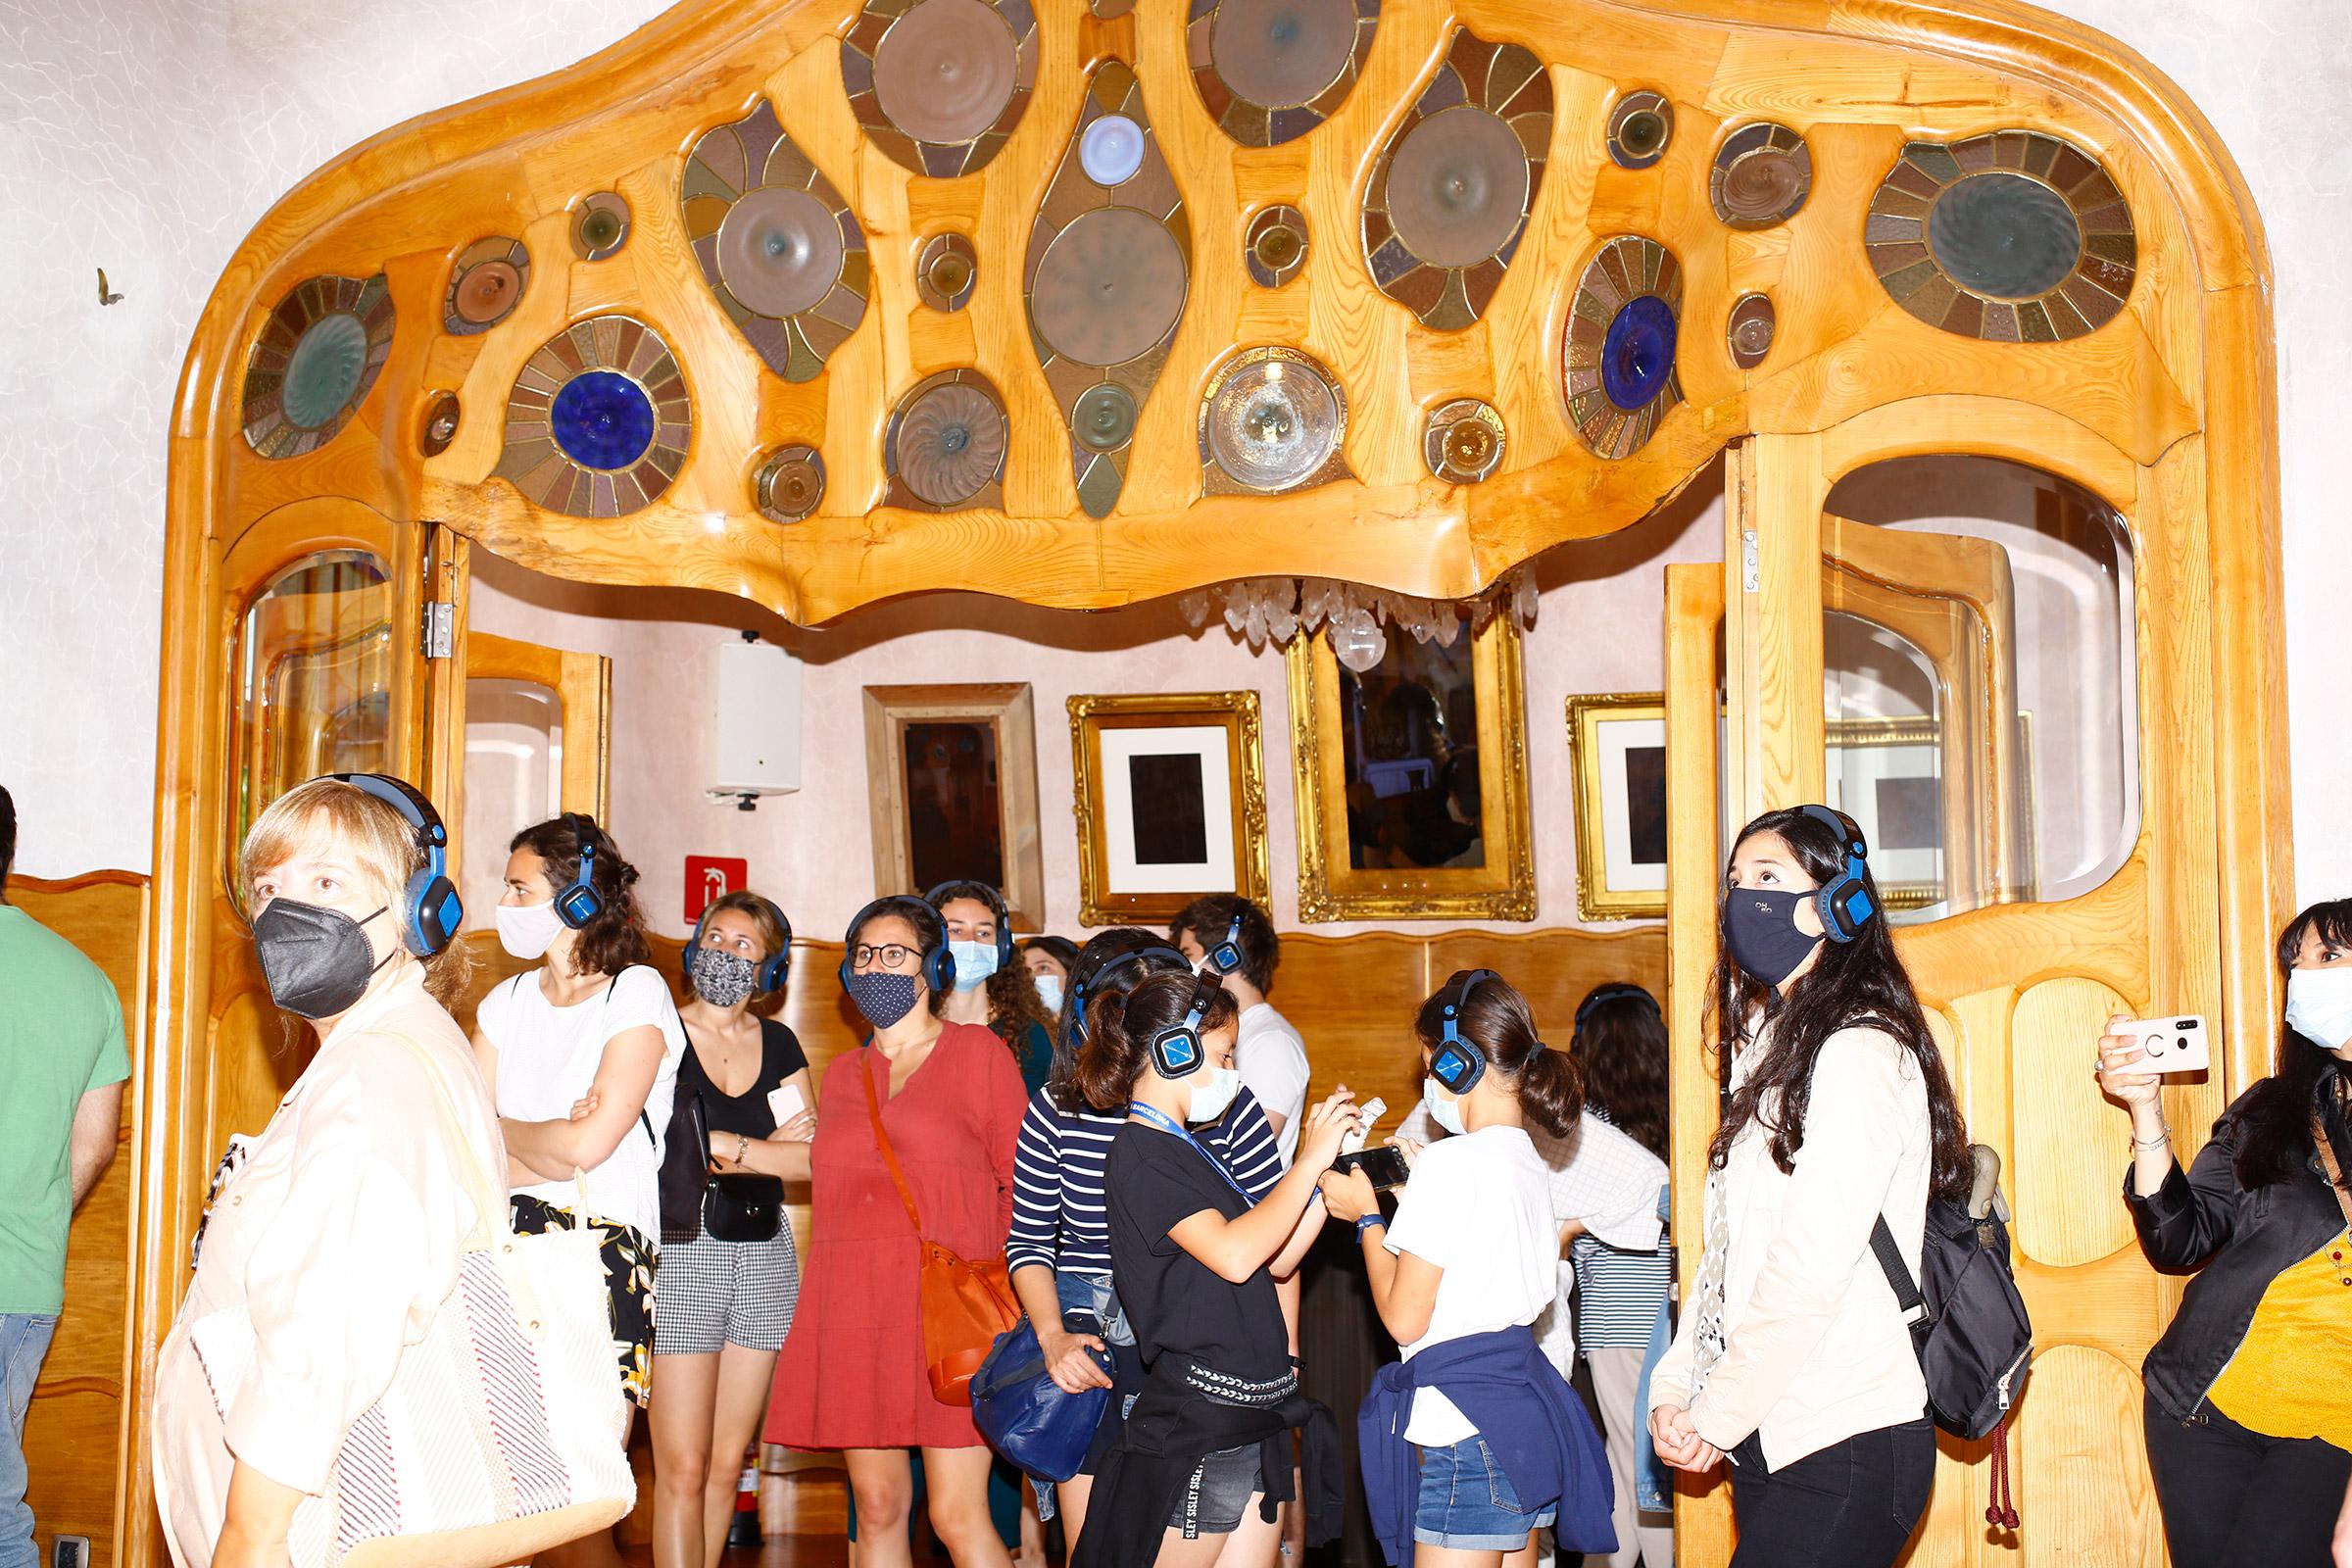 Masked tourists visit Casa Batlló on June 6.